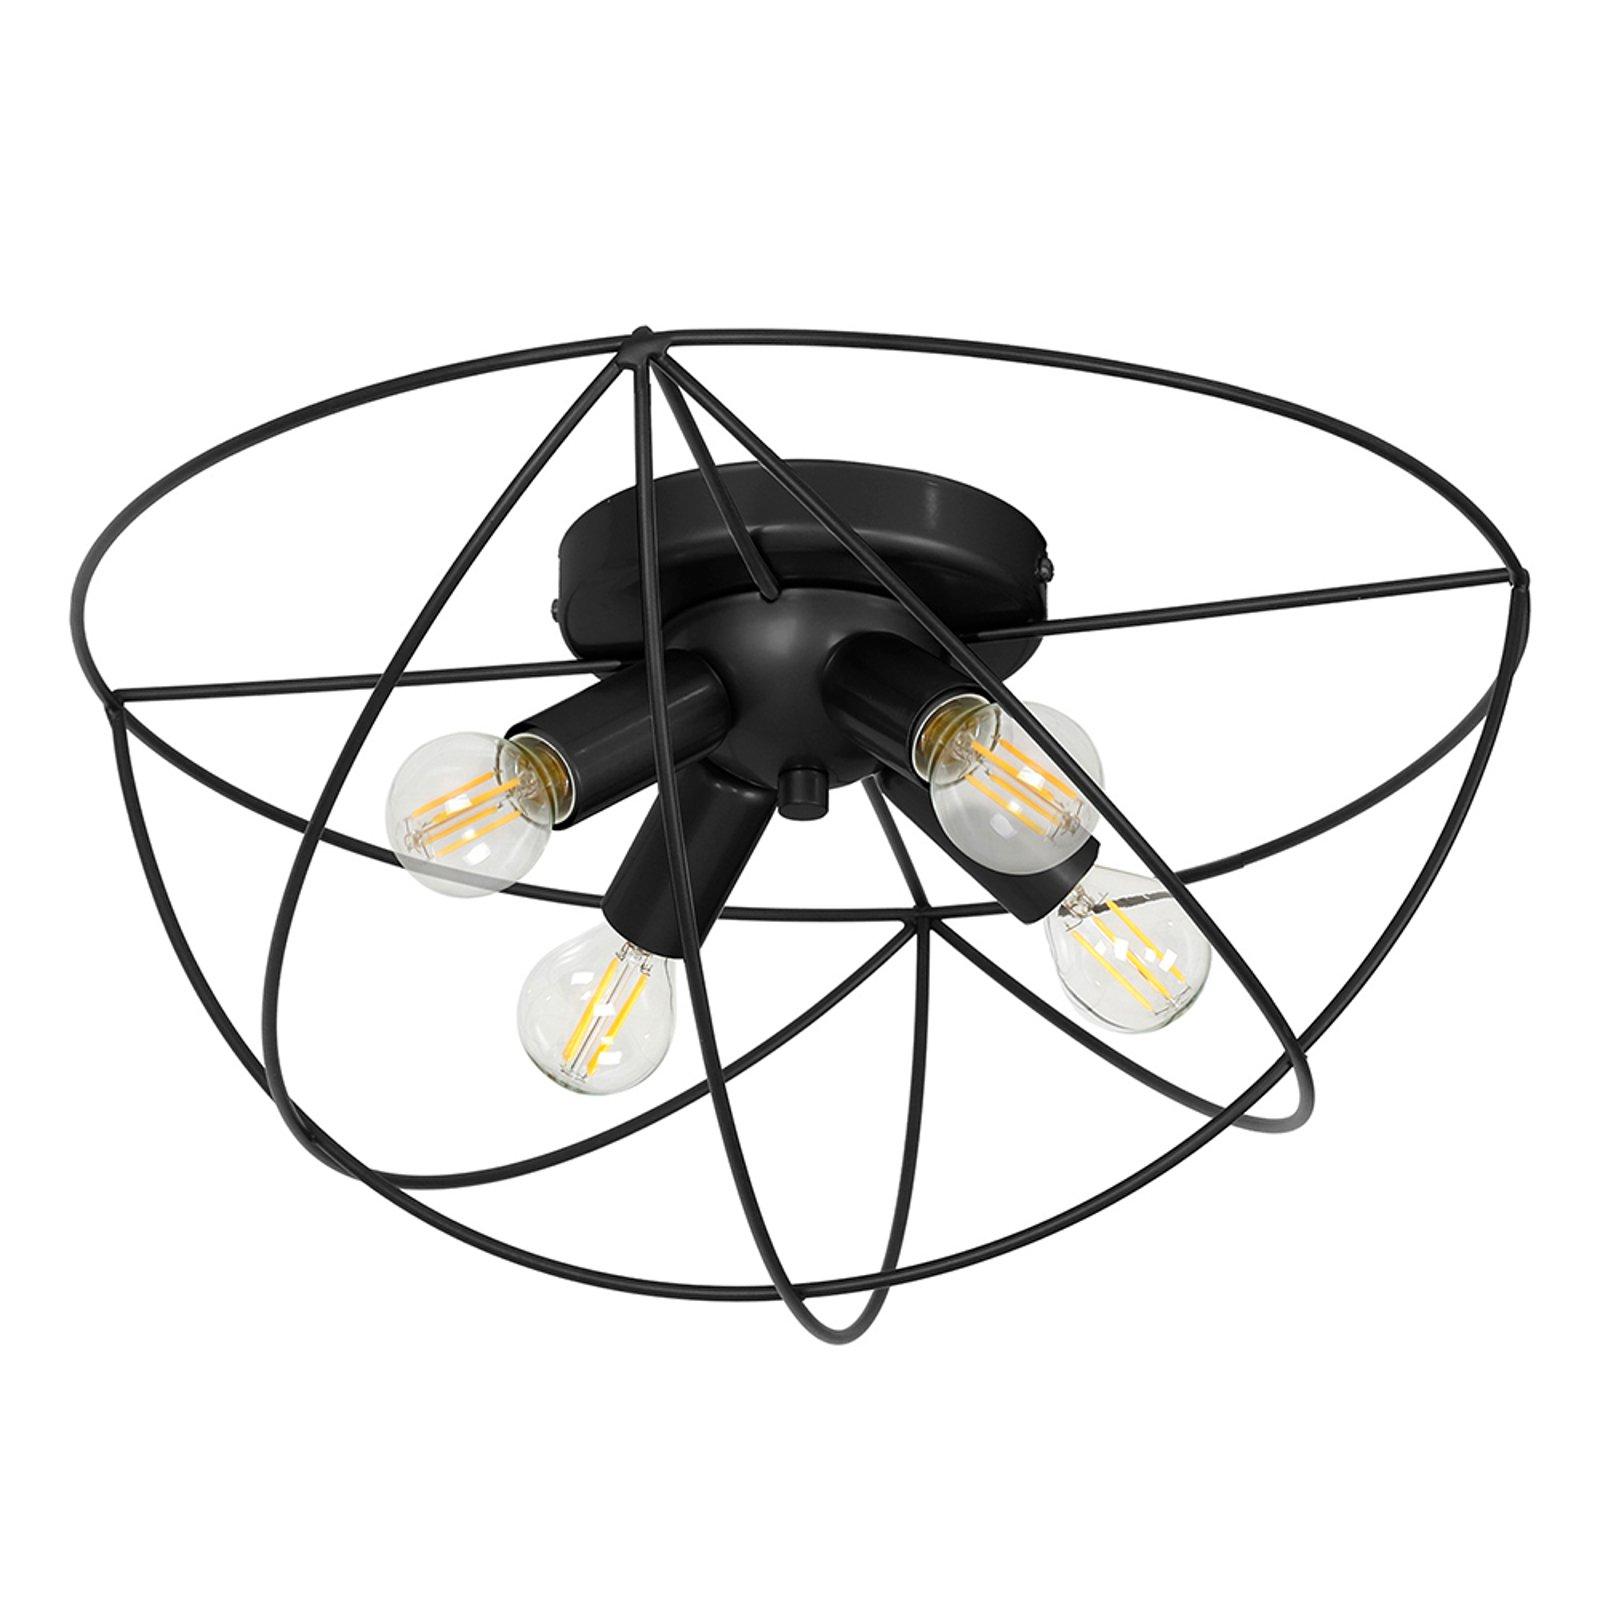 Copernicus taklampe, 4 lyskilder svart